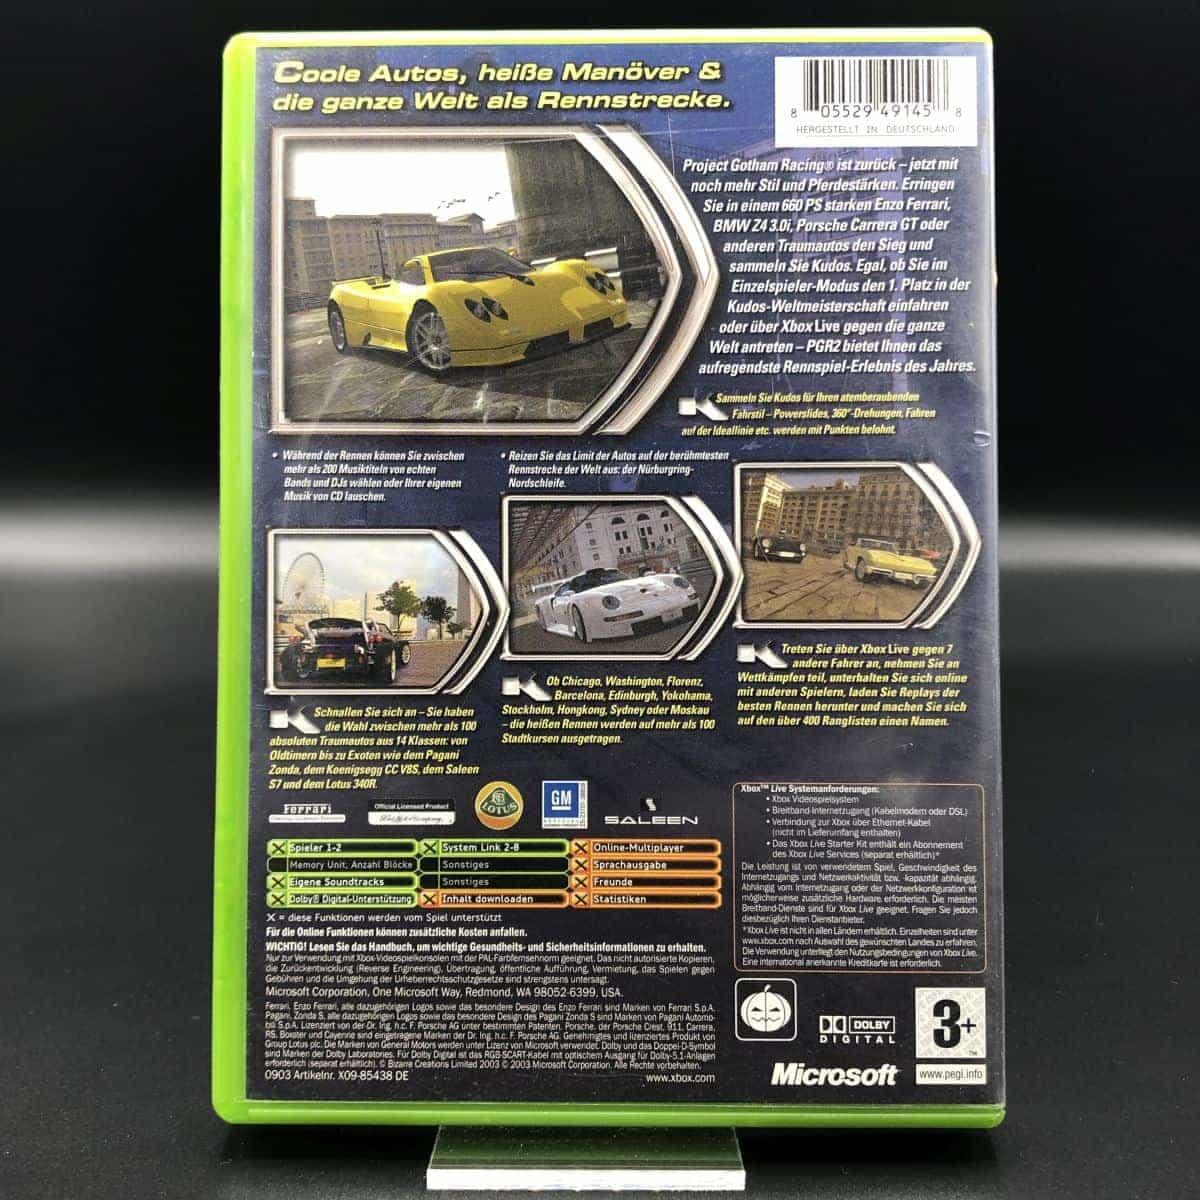 XBC Project Gotham Racing 2 (Komplett) (Gebrauchsspuren) Microsoft Xbox Classic